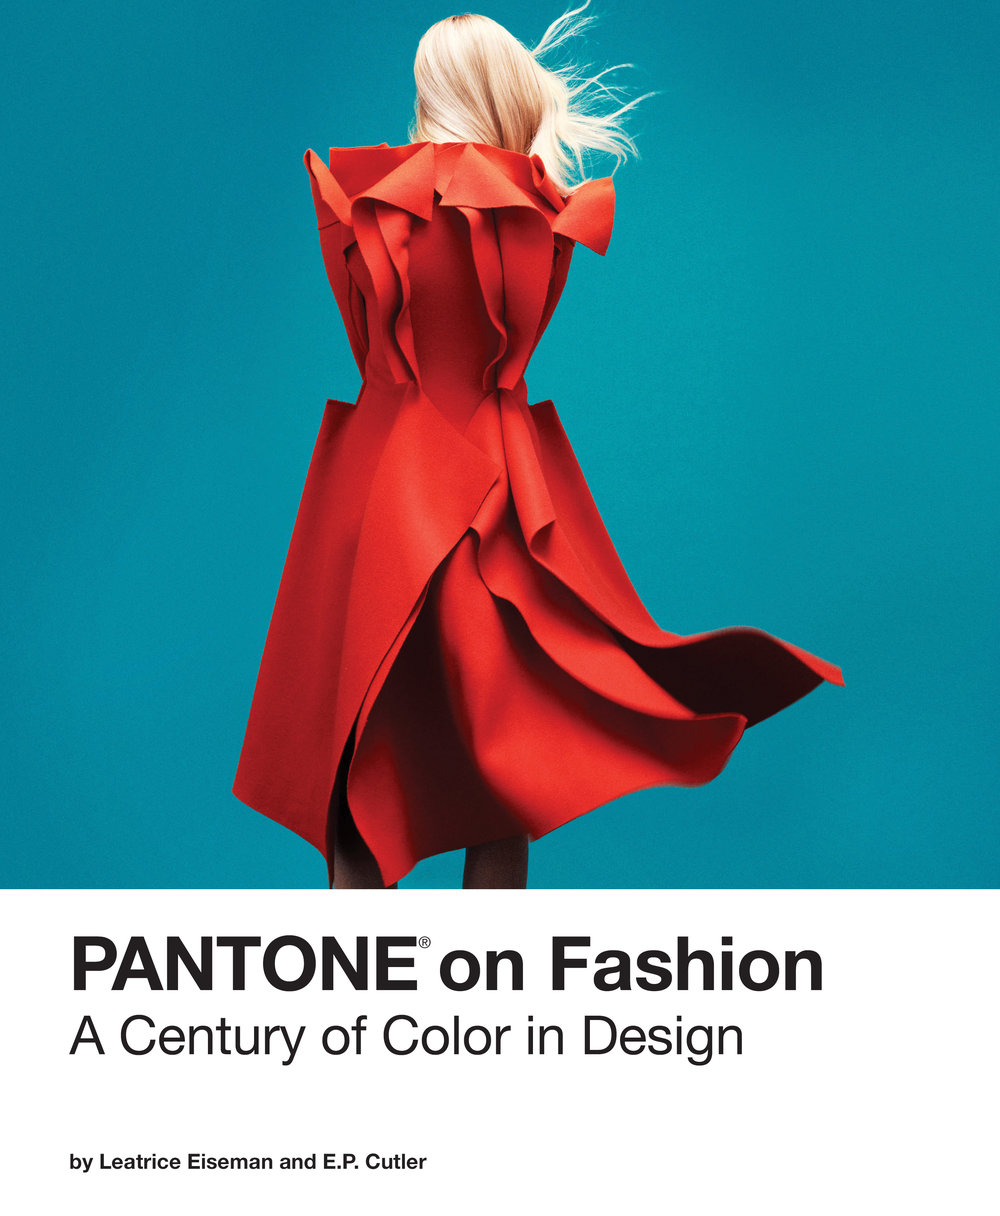 PANTONE on Fashion-updatedtext.jpg